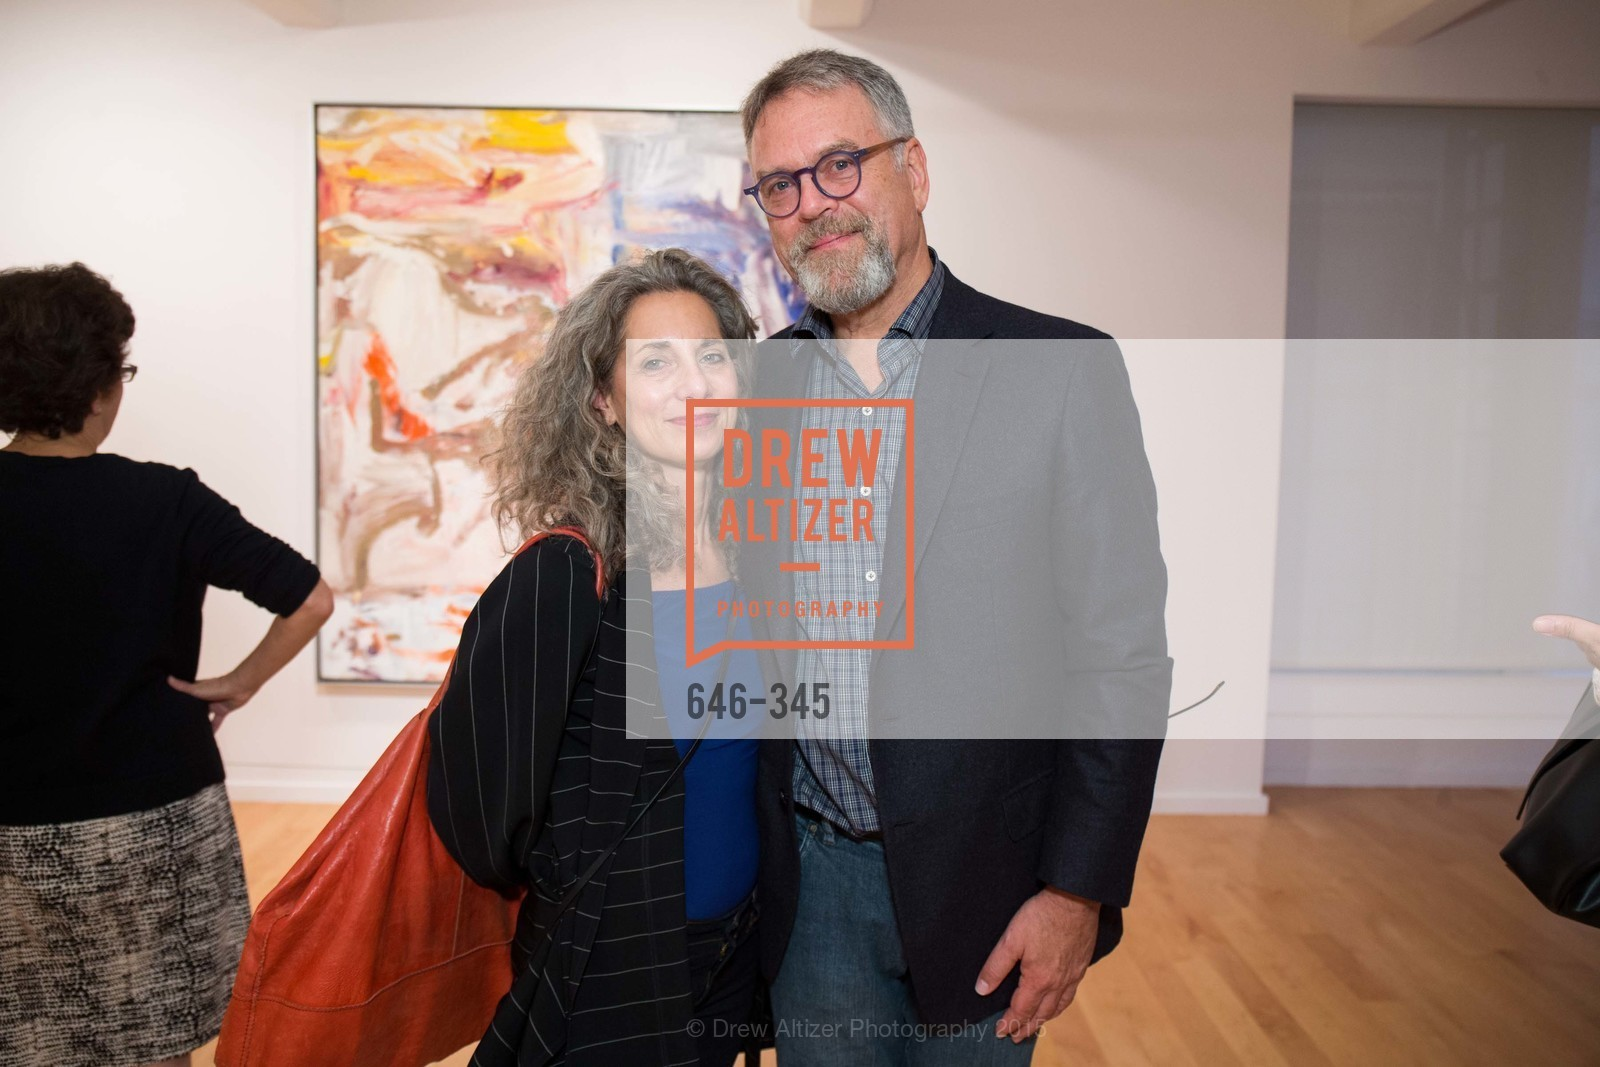 Frish Brandt, Nion McEvoy, John Berggruen Gallery presents